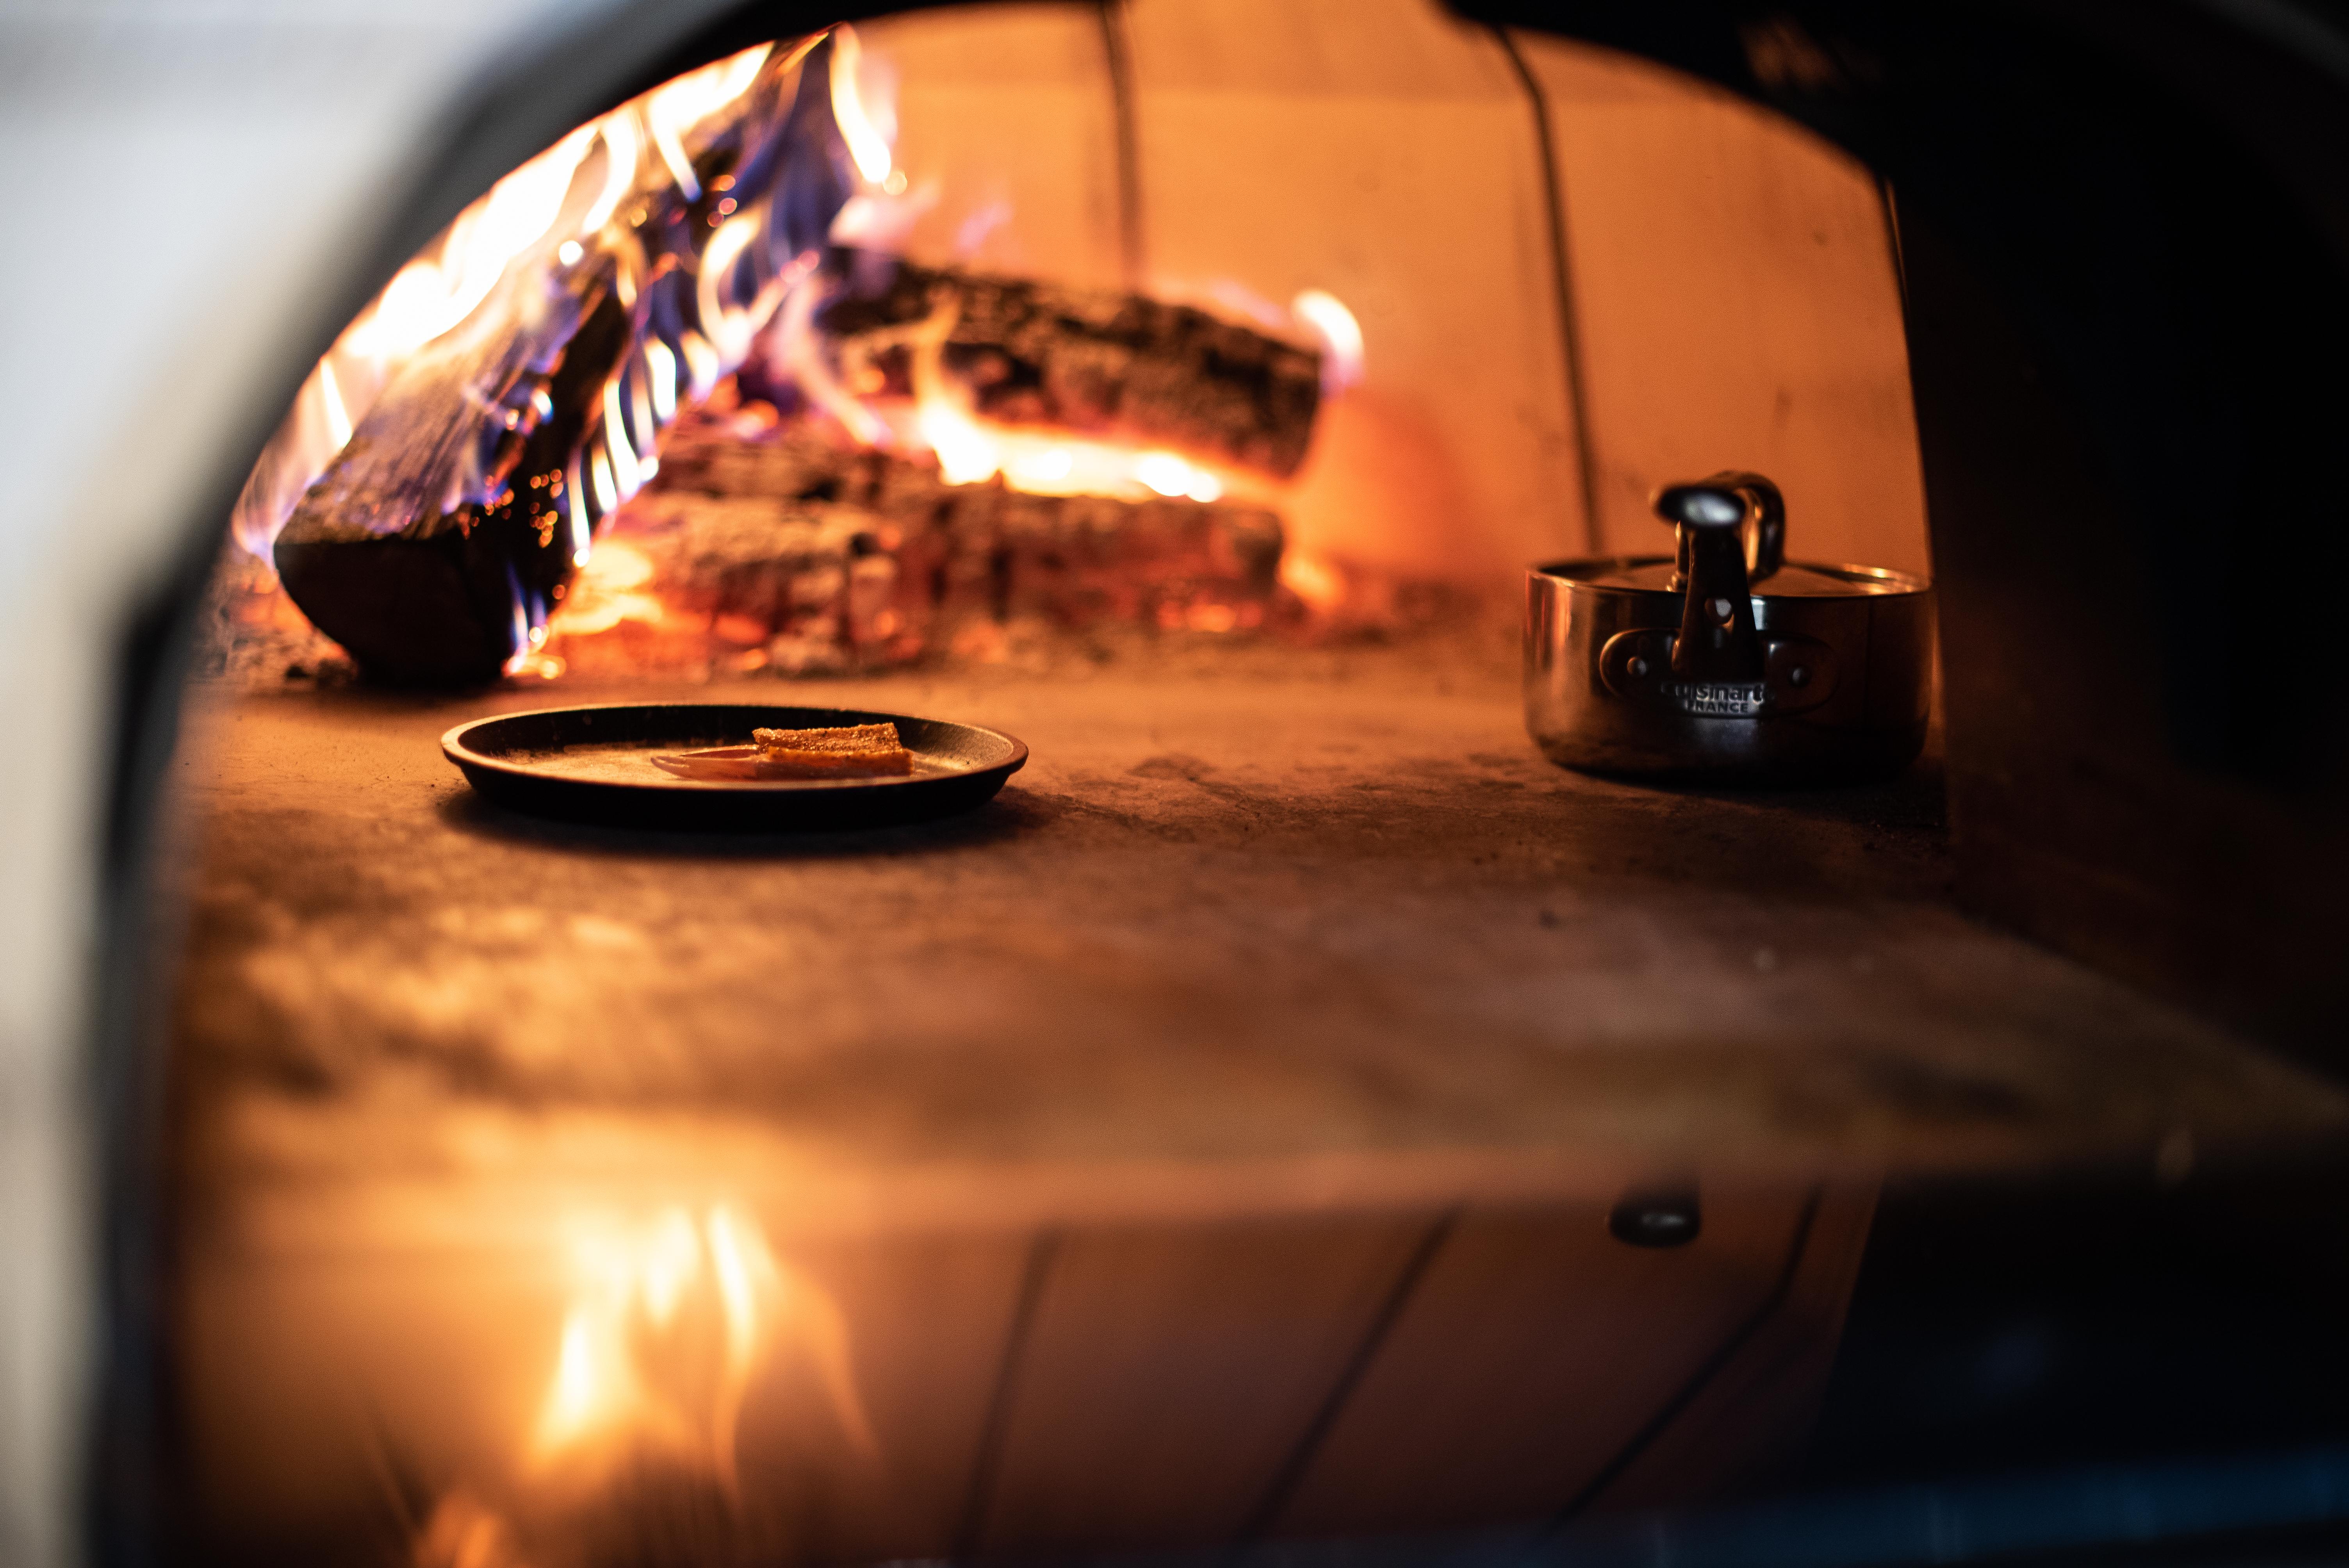 Fire burning oven